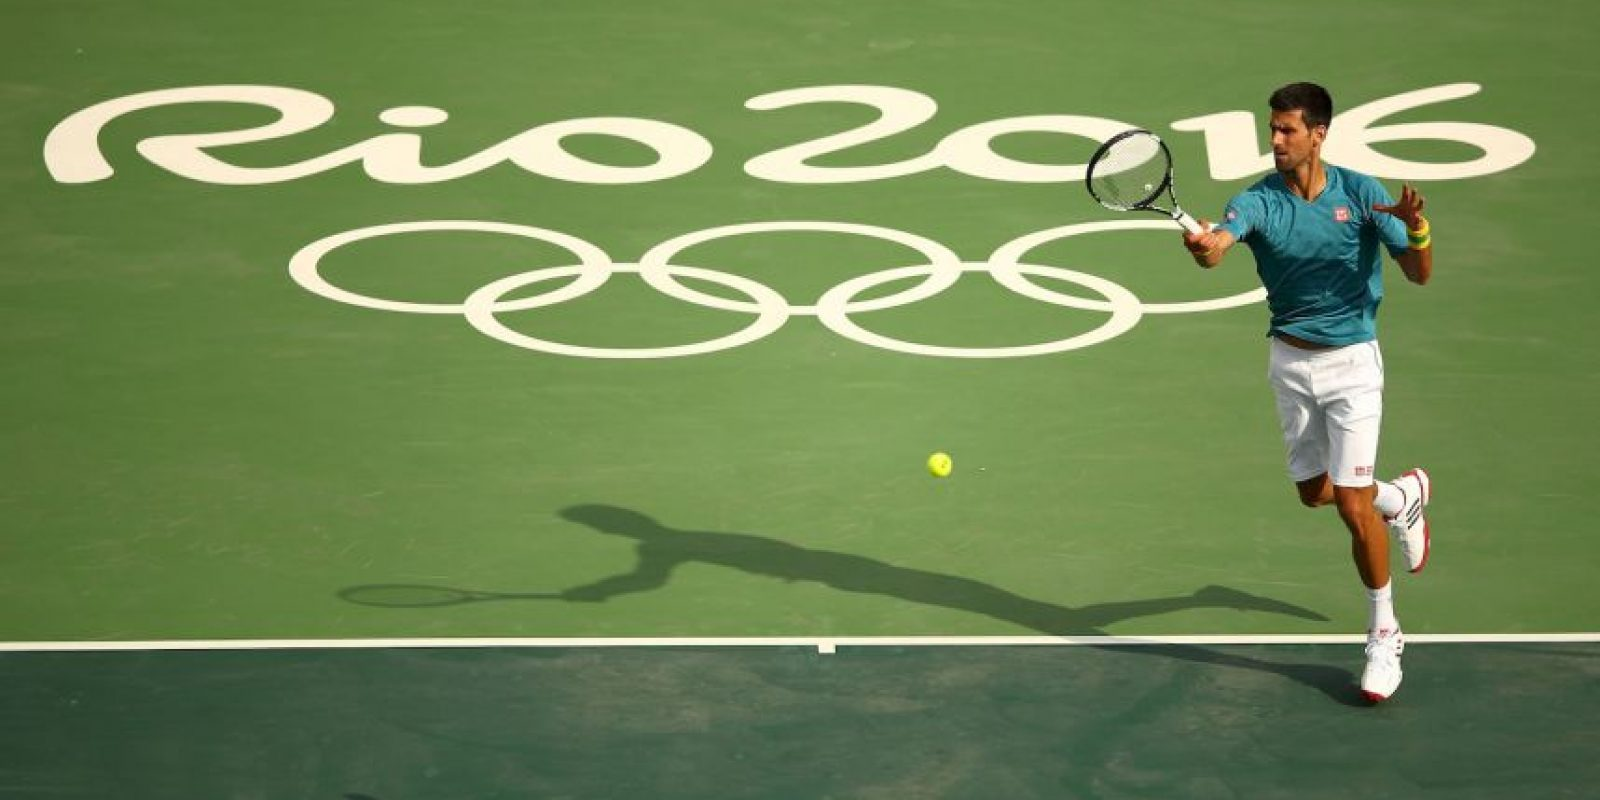 2. Novak Djokovic: 55.8 millons de dólares (Tenis / Serbia) Foto:Getty Images